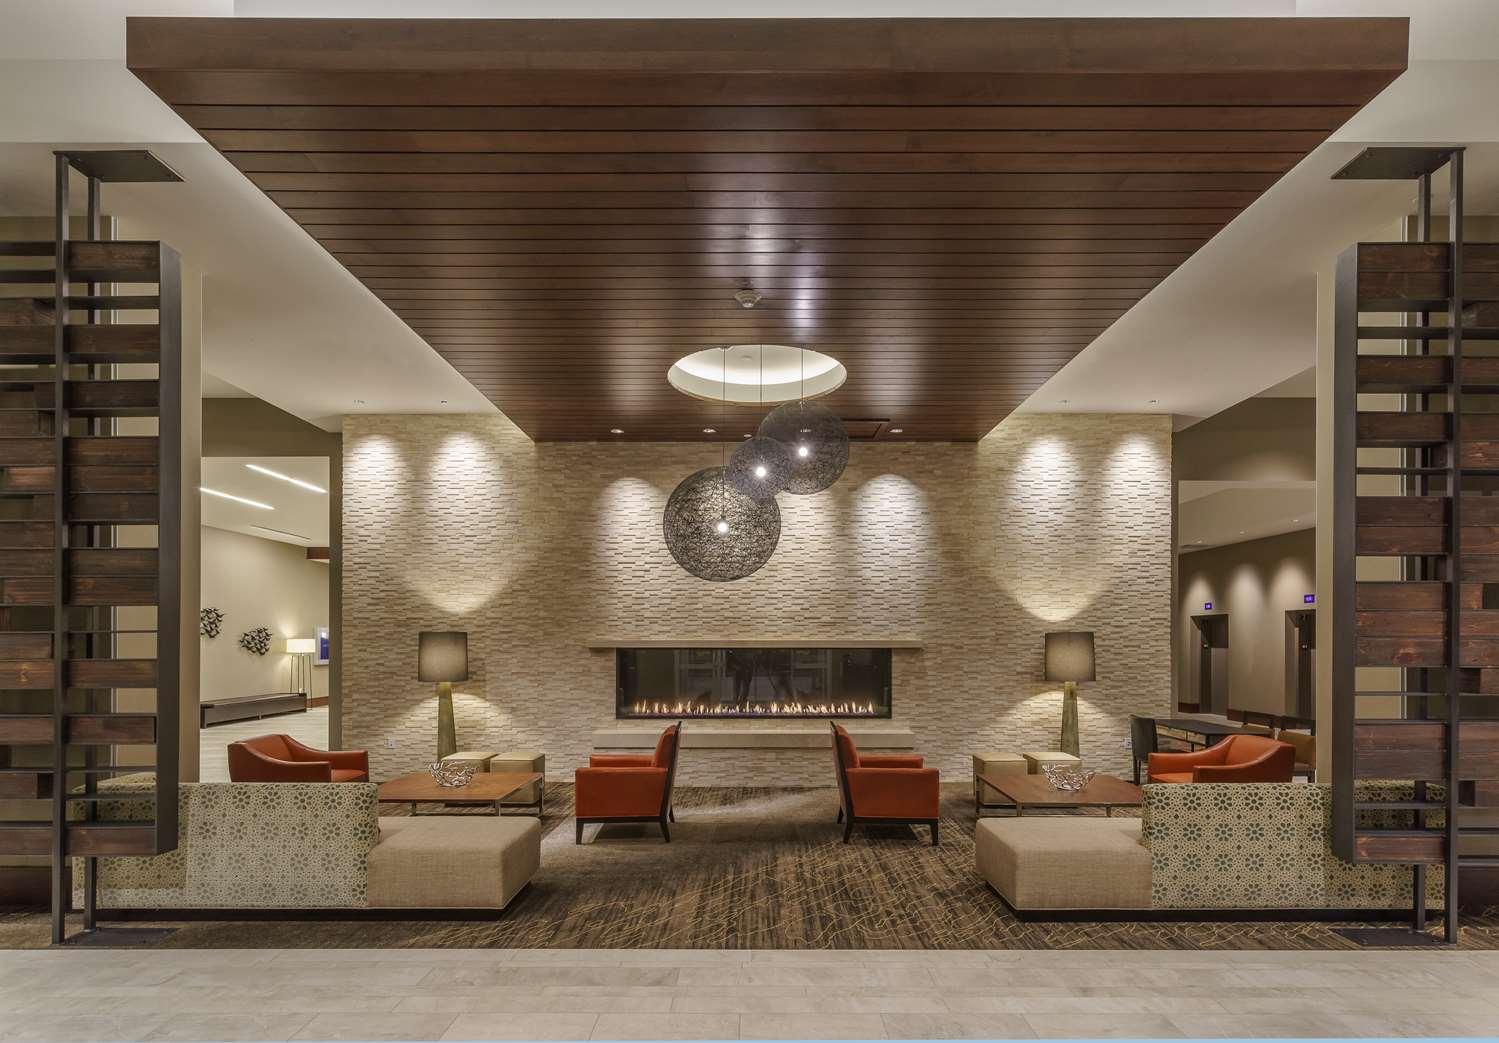 Lobby - Hyatt Regency Hotel Conference Center Aurora